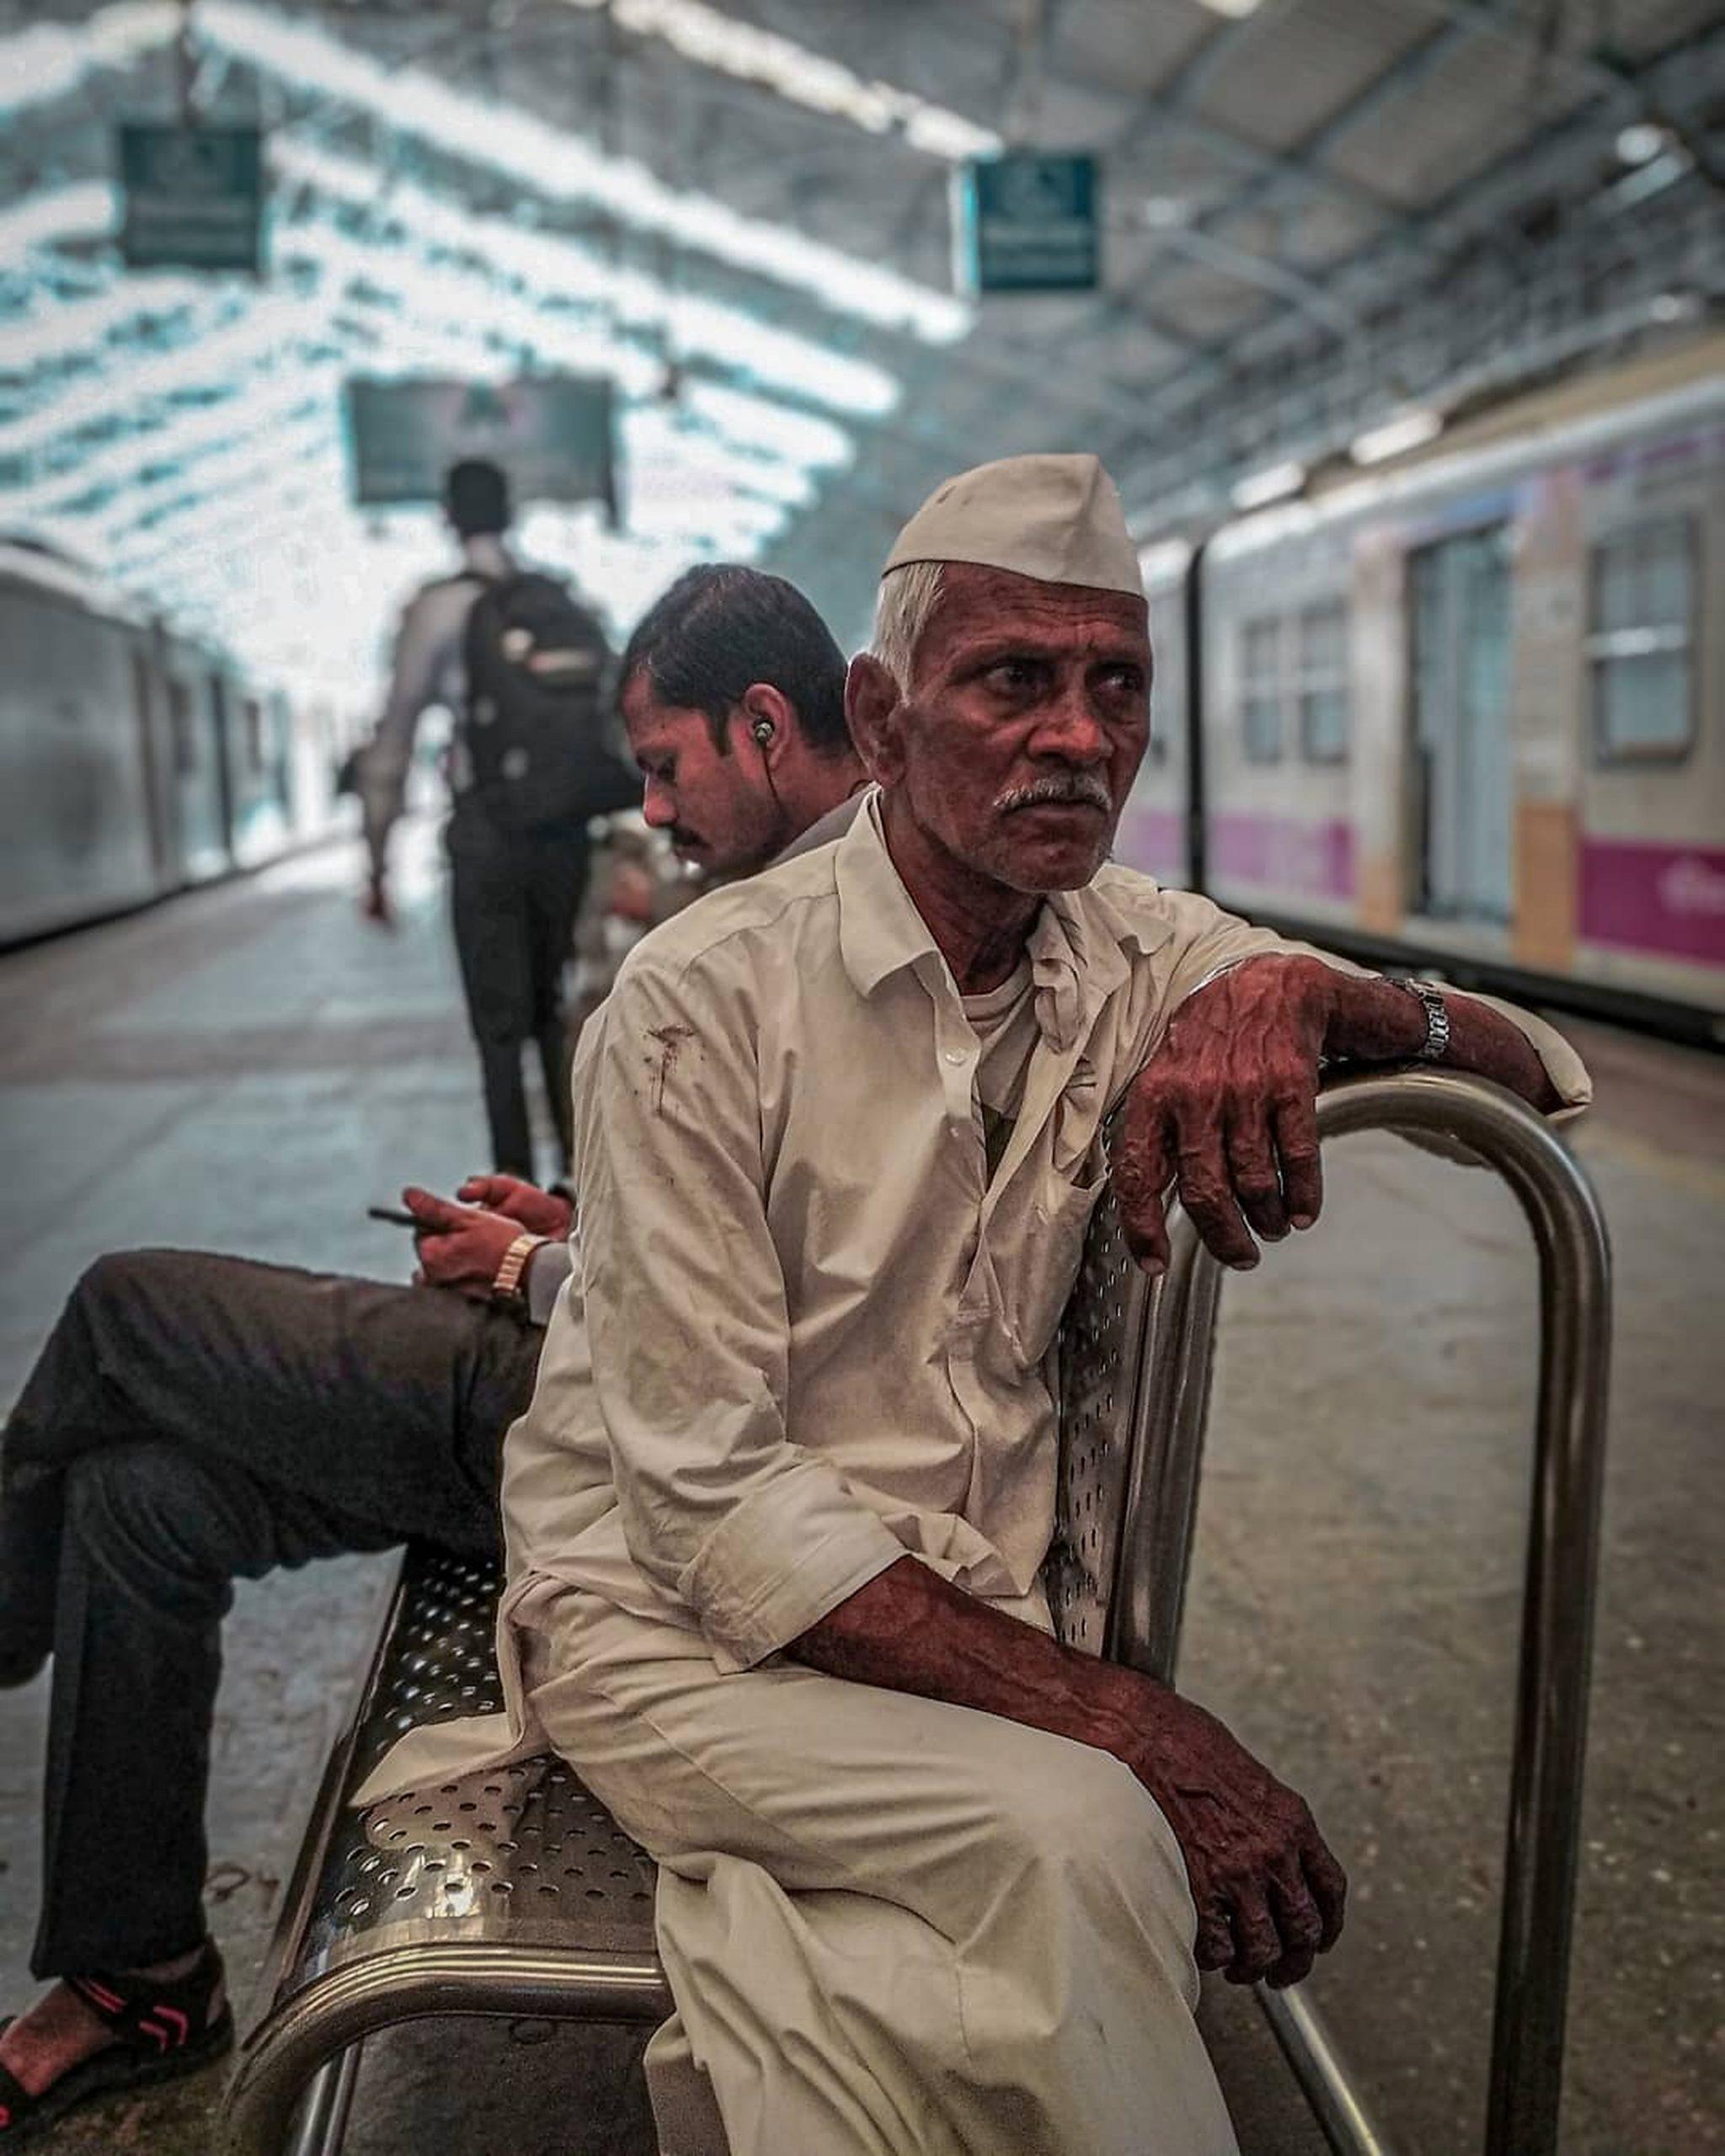 Old Man At Platform